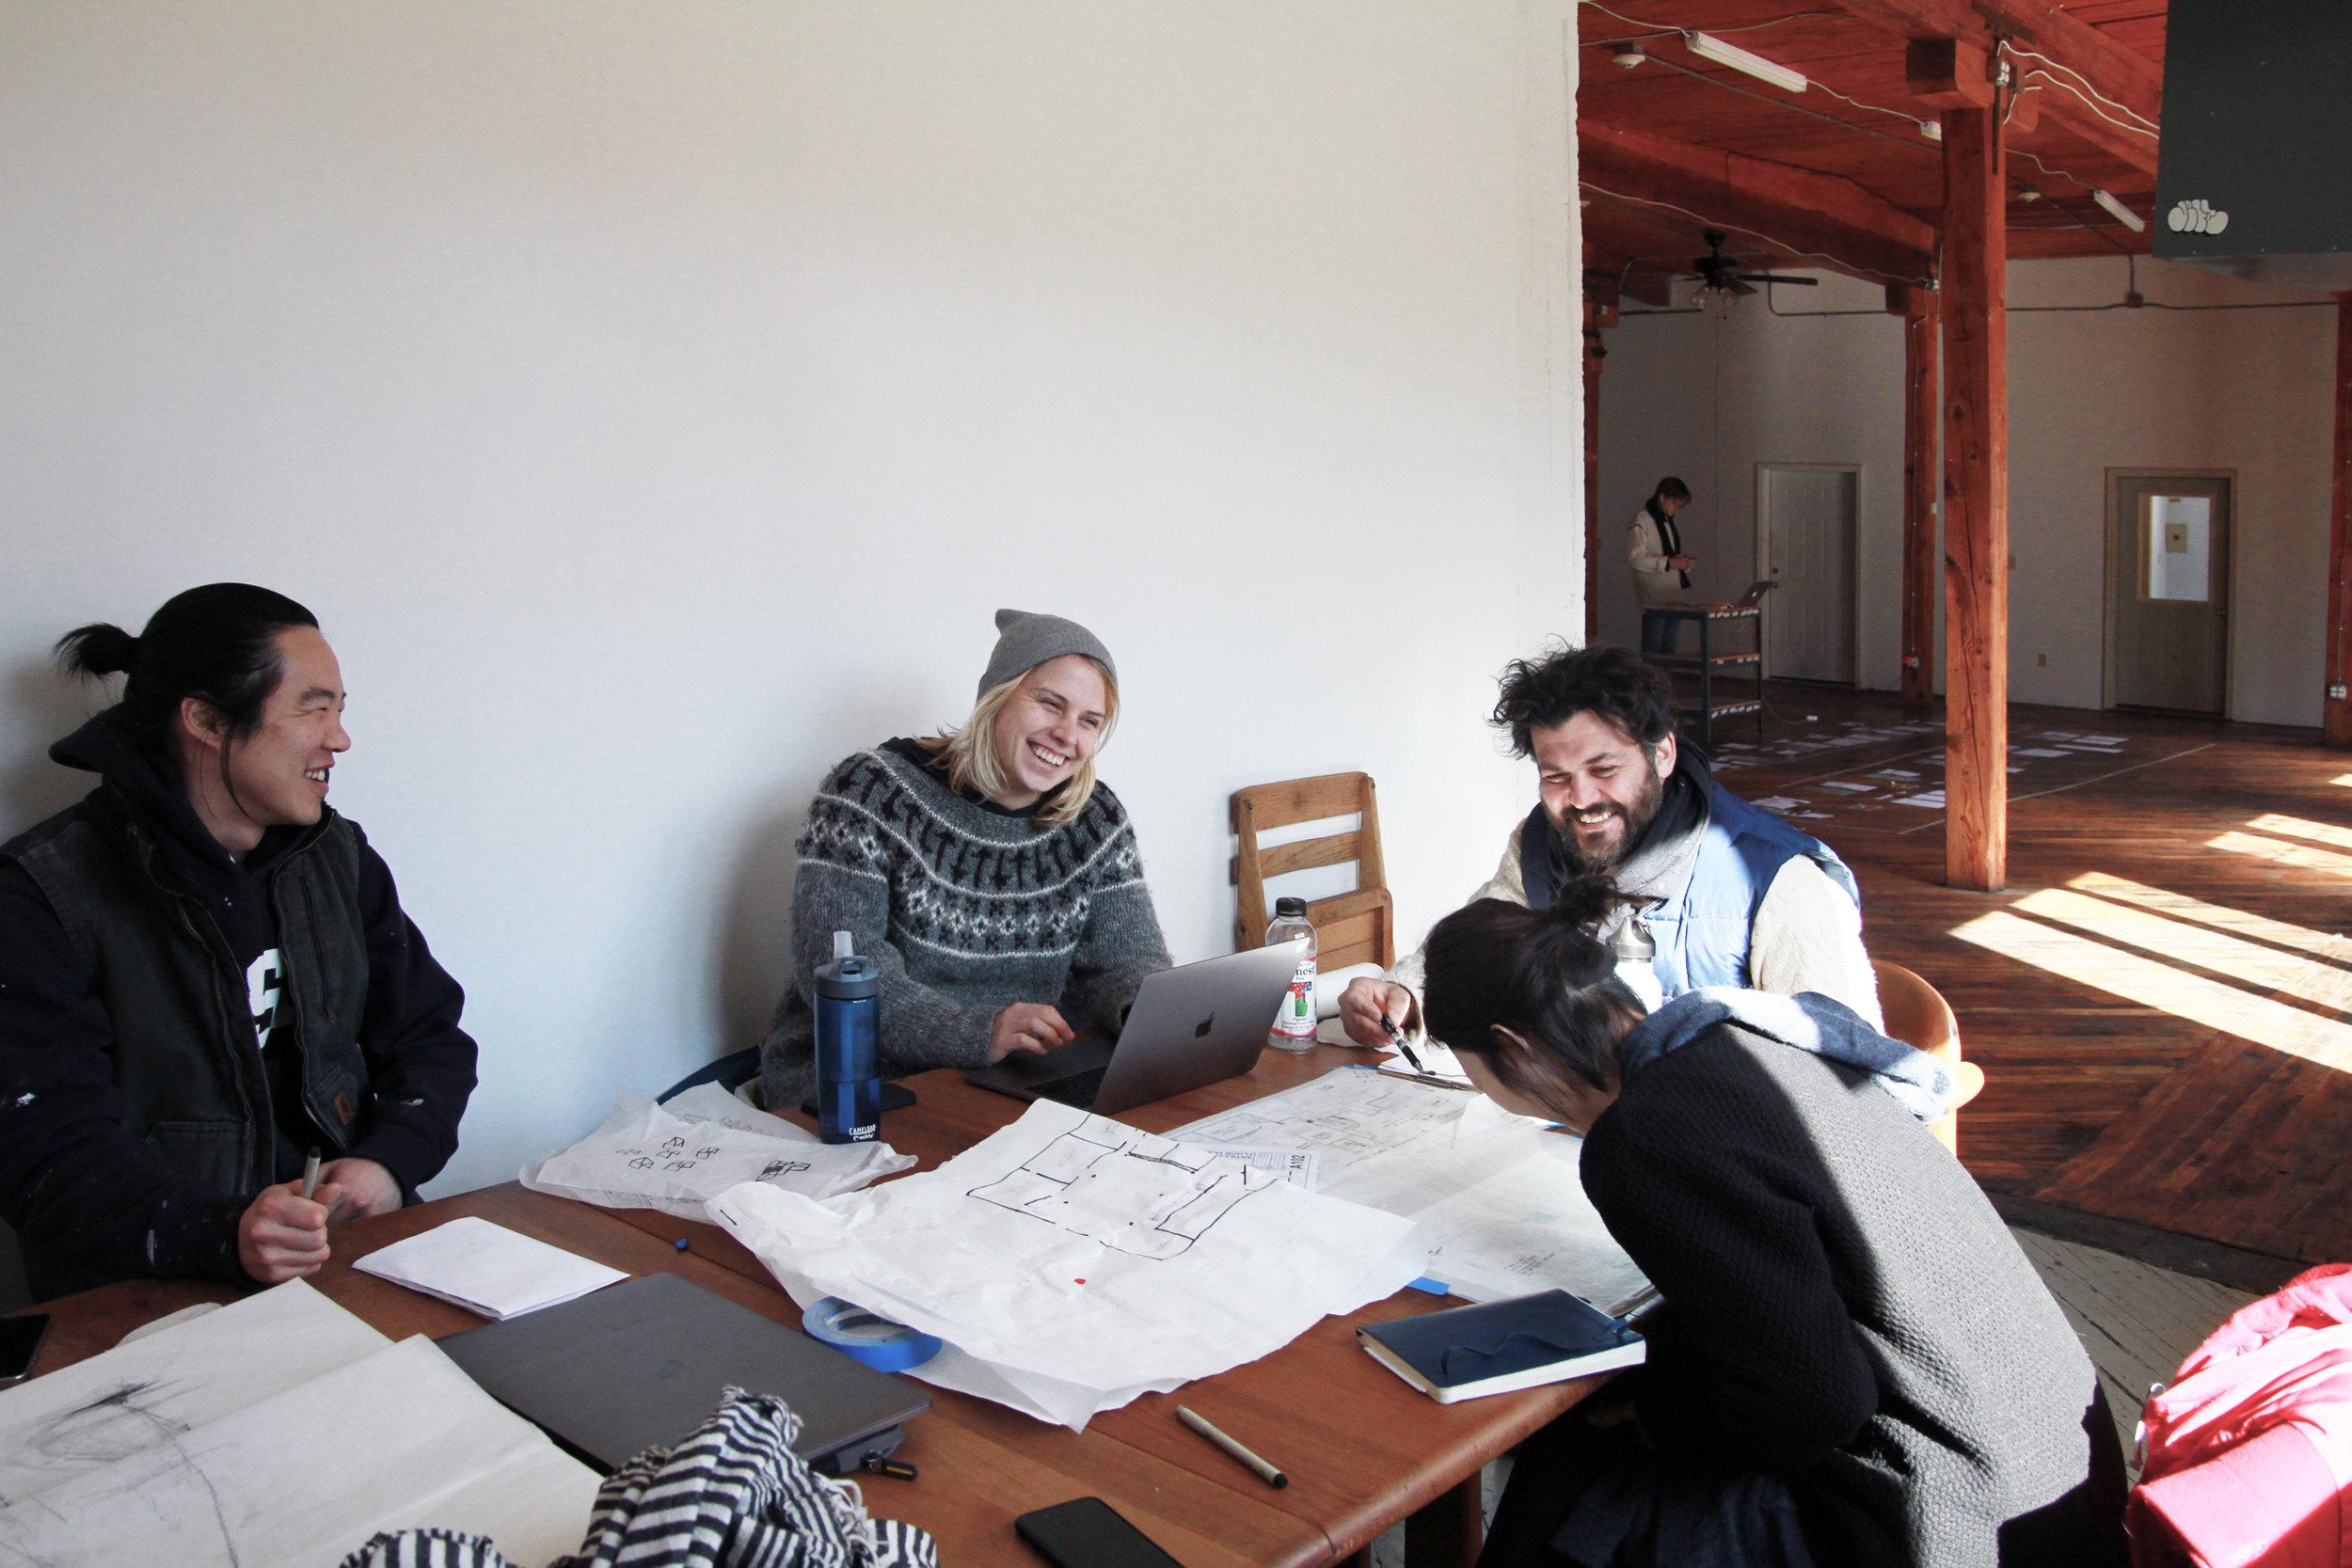 Studios_Alcove_Meeting _3.JPG